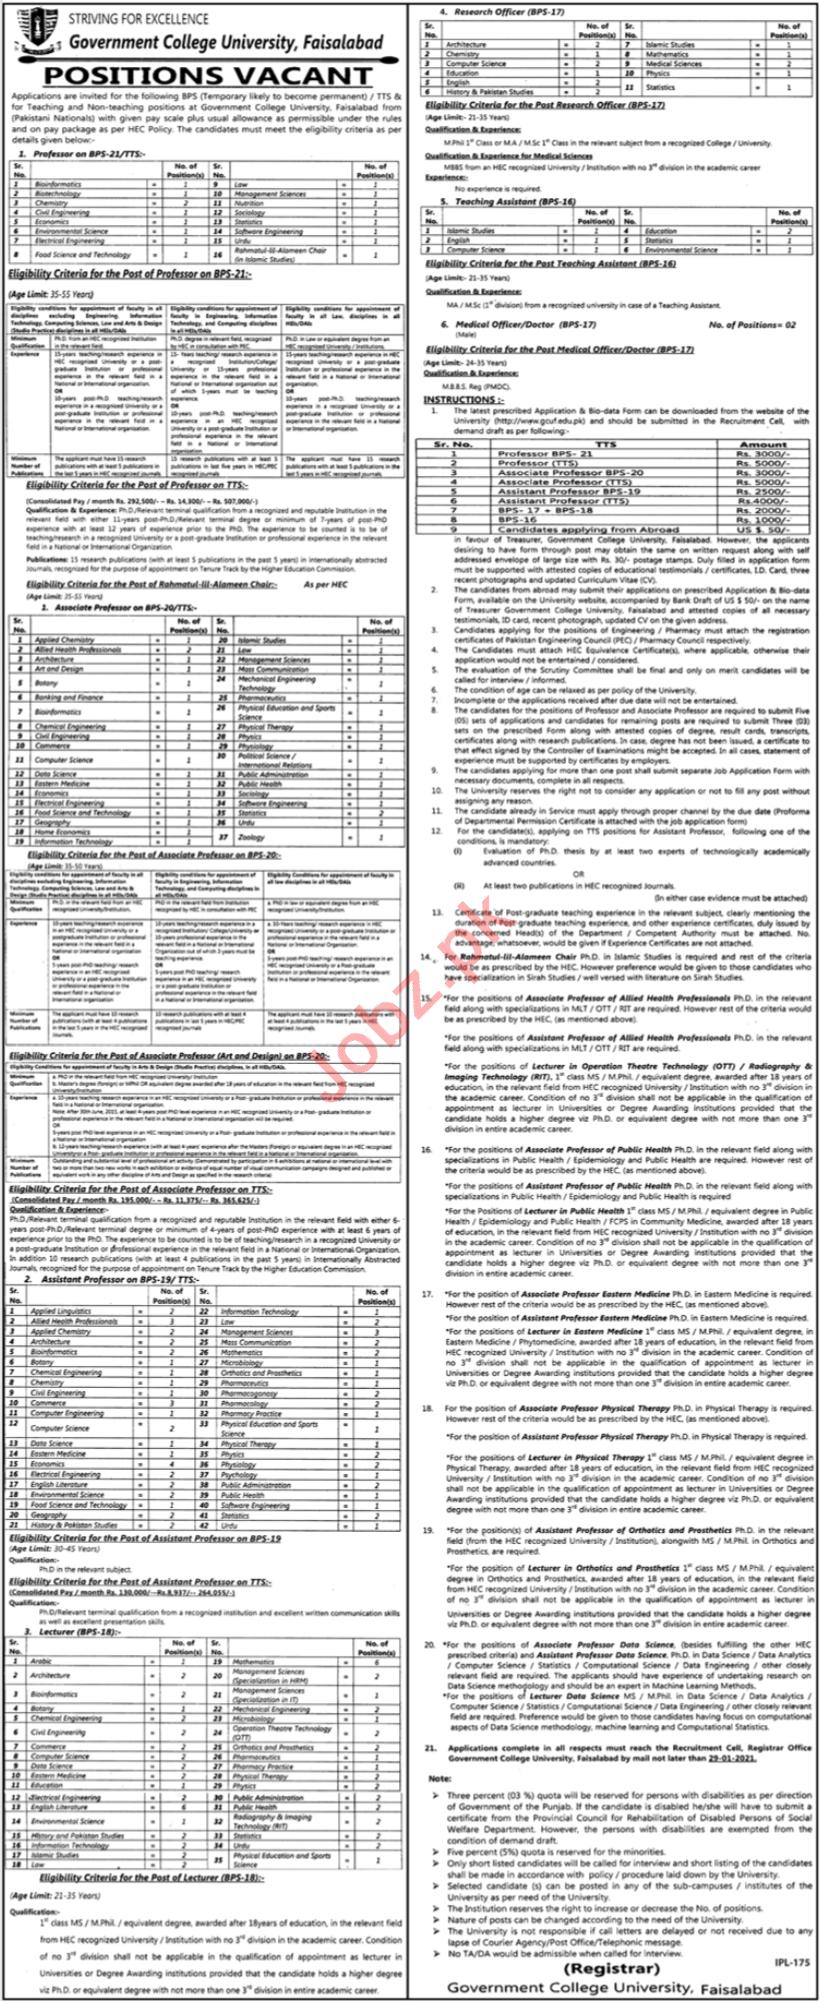 GC University - Government College University Faisalabad Jobs 2021 - GC University Faisalabad - GCU Faisalabad 2021 - How to Apply in GC University Faisalabad - gcuf.edu.pk/career